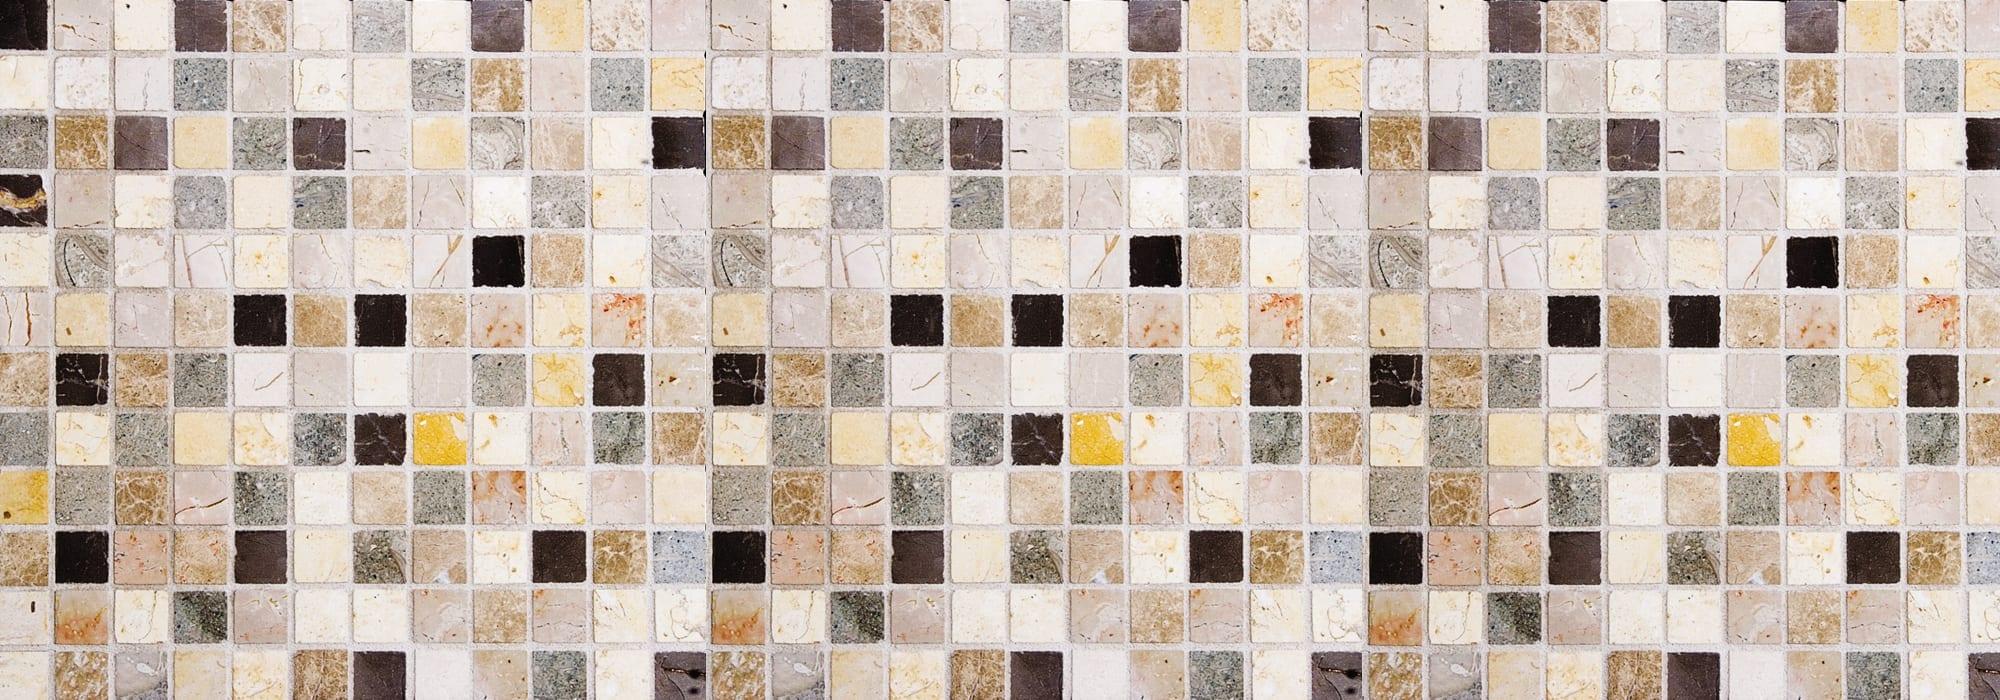 Adi Stone Mosaic 2.5*2.5 by Milstone